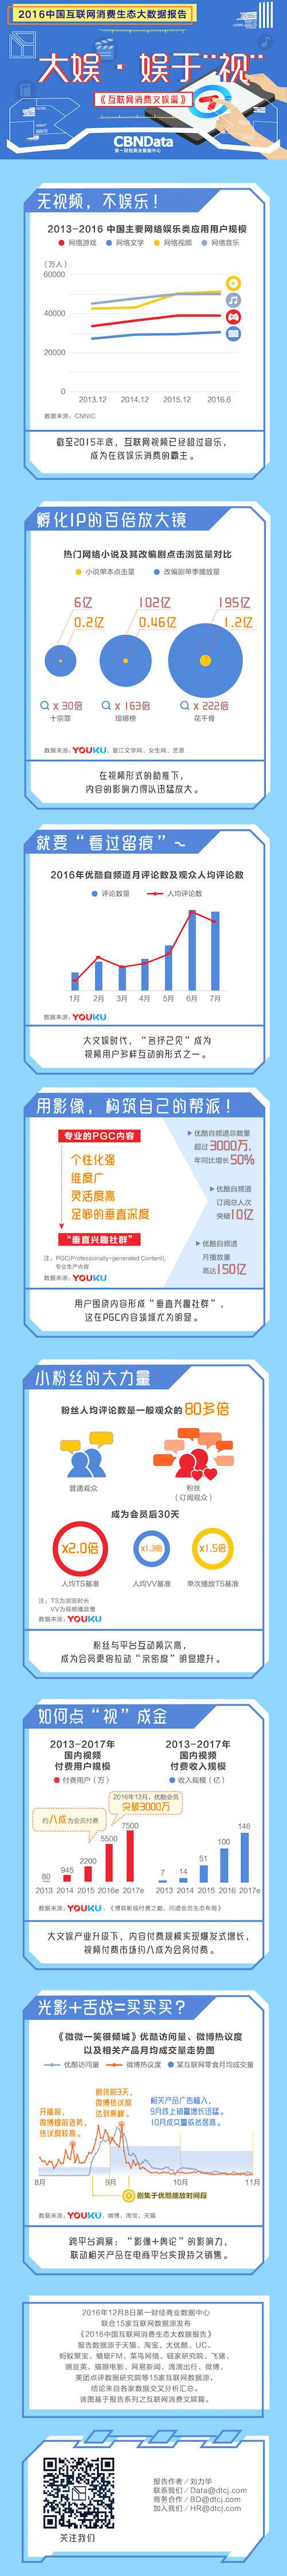 D9-文娱篇(1)